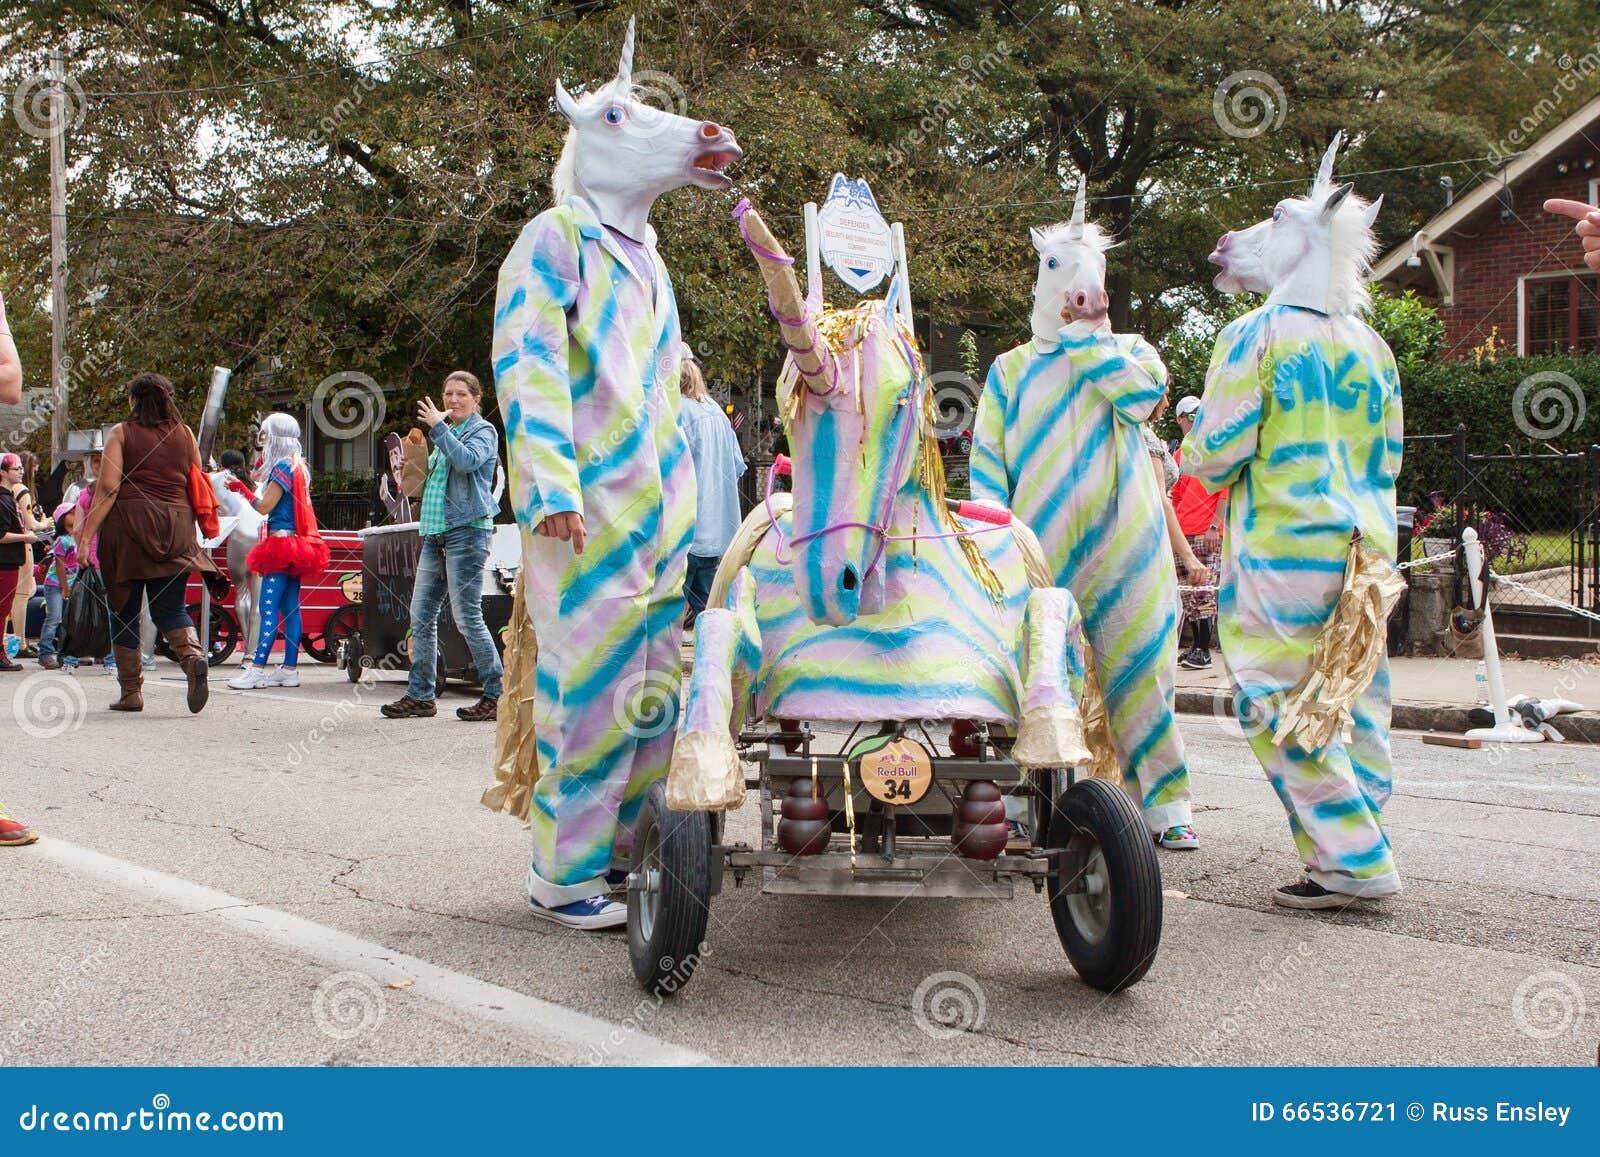 Red Bull Soap Box Derby >> Team Dressed Like Unicorns Awaits Run At Soap Box Derby Editorial Photo - Image of creativity ...